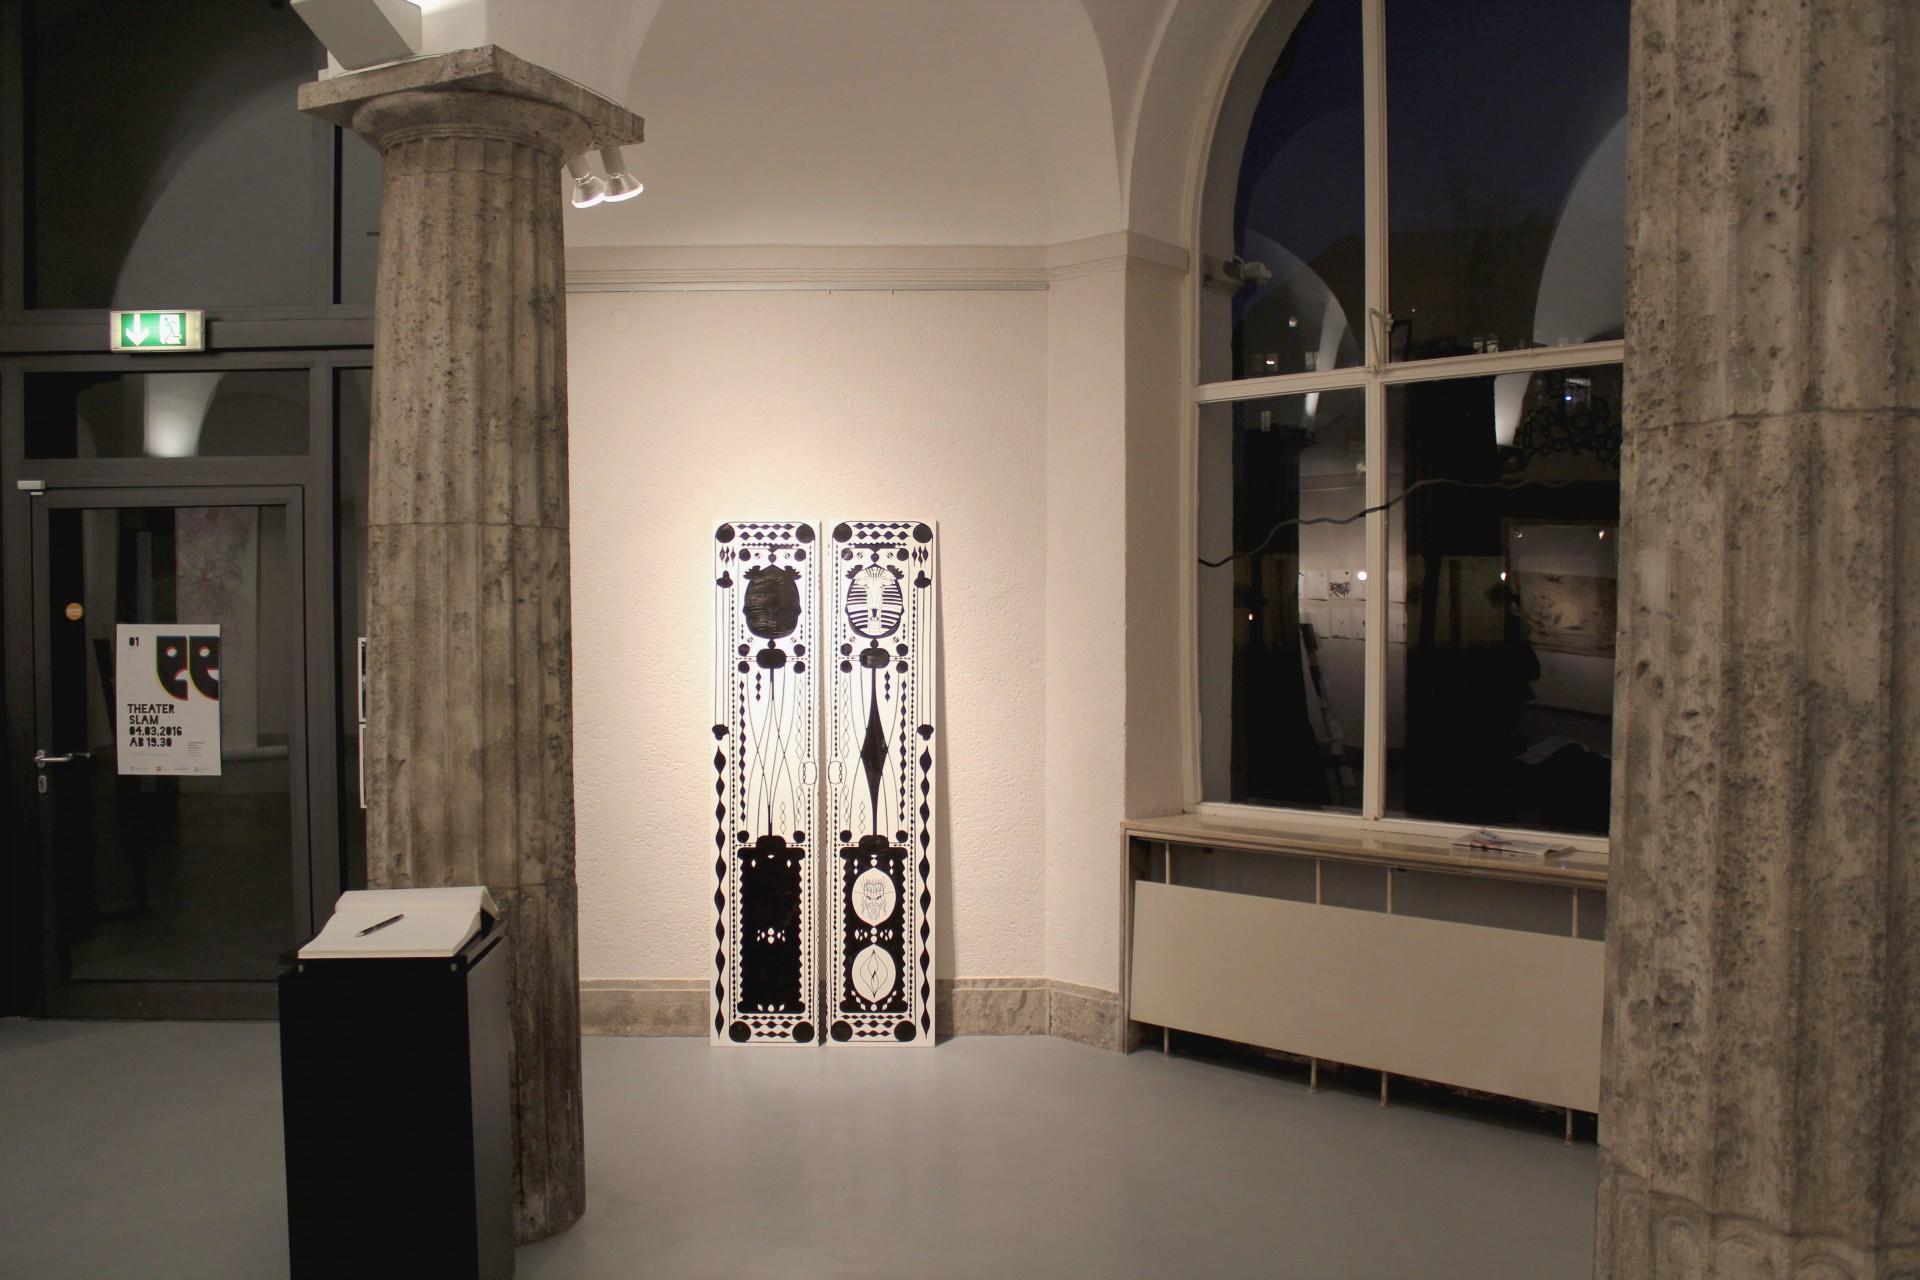 Art and design by Jonas Horbach Tut Elk Amun